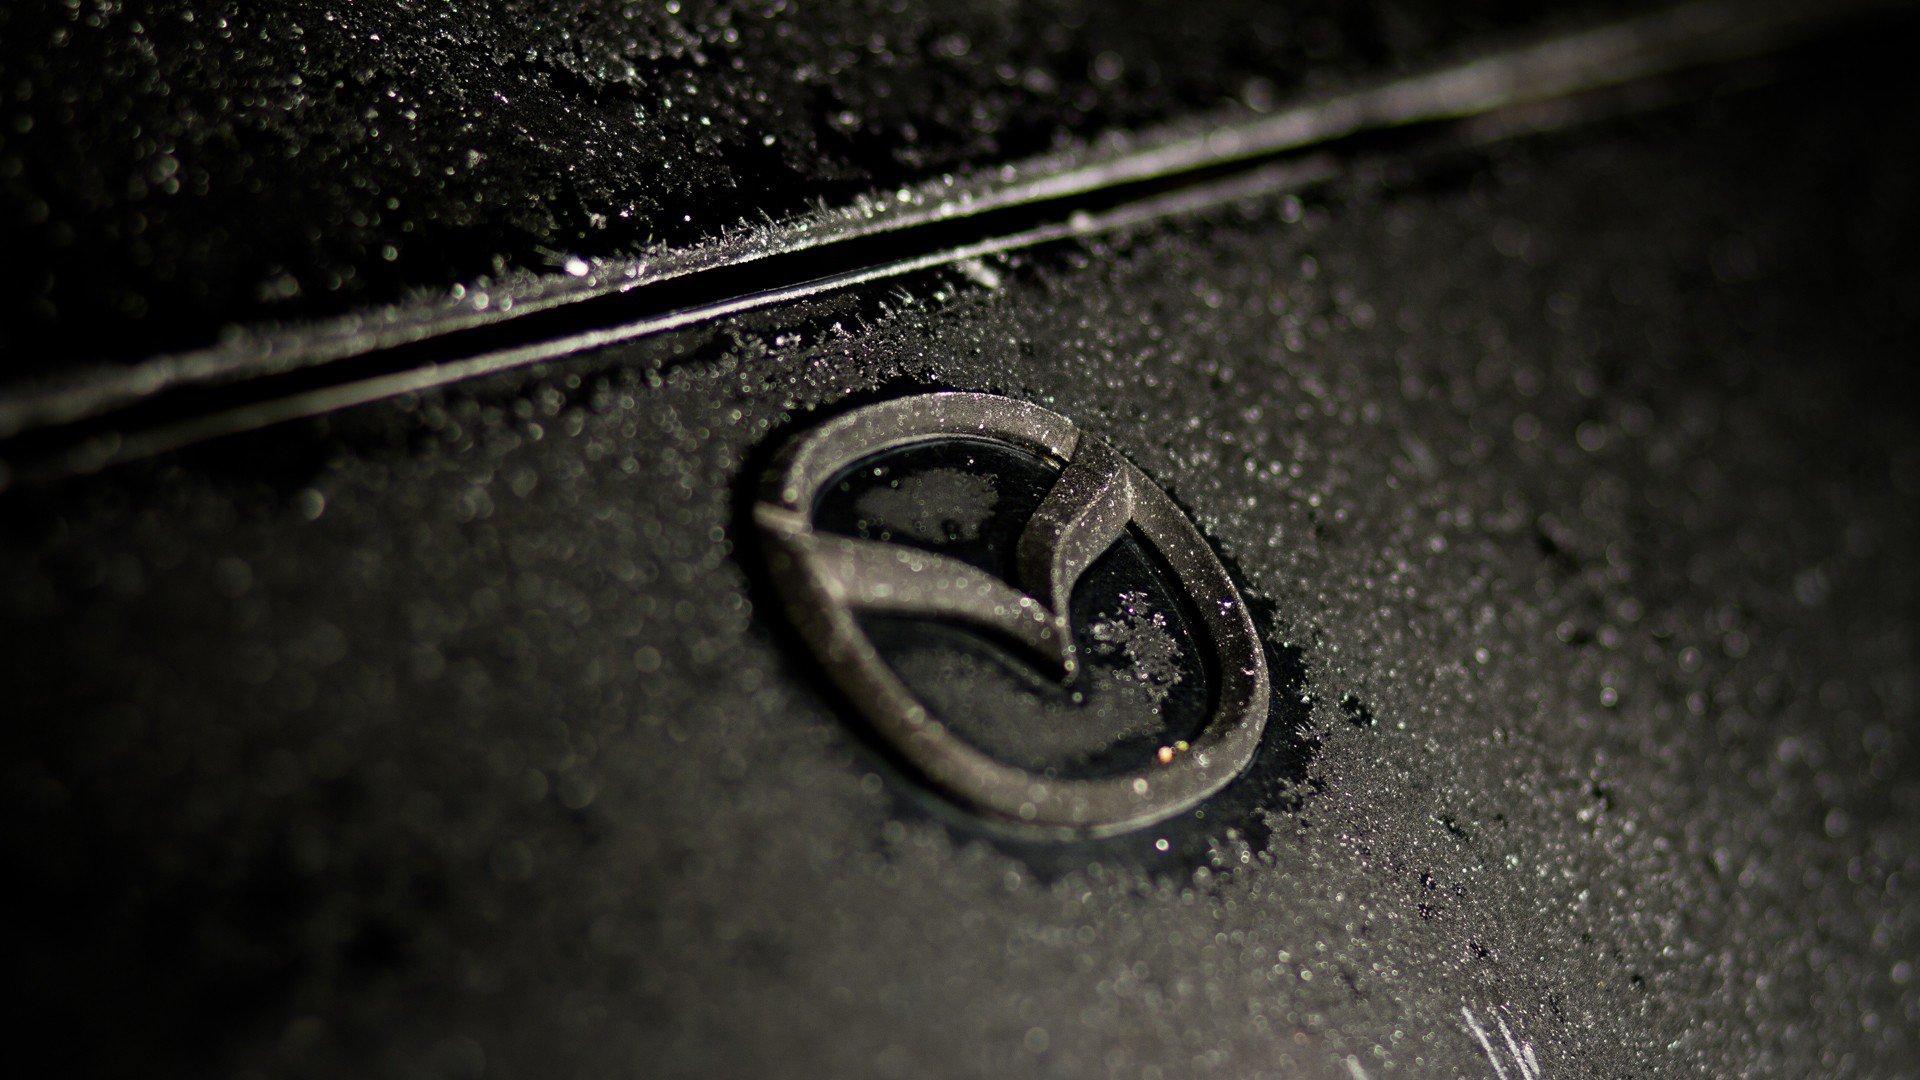 Vehicles - Mazda  Wallpaper